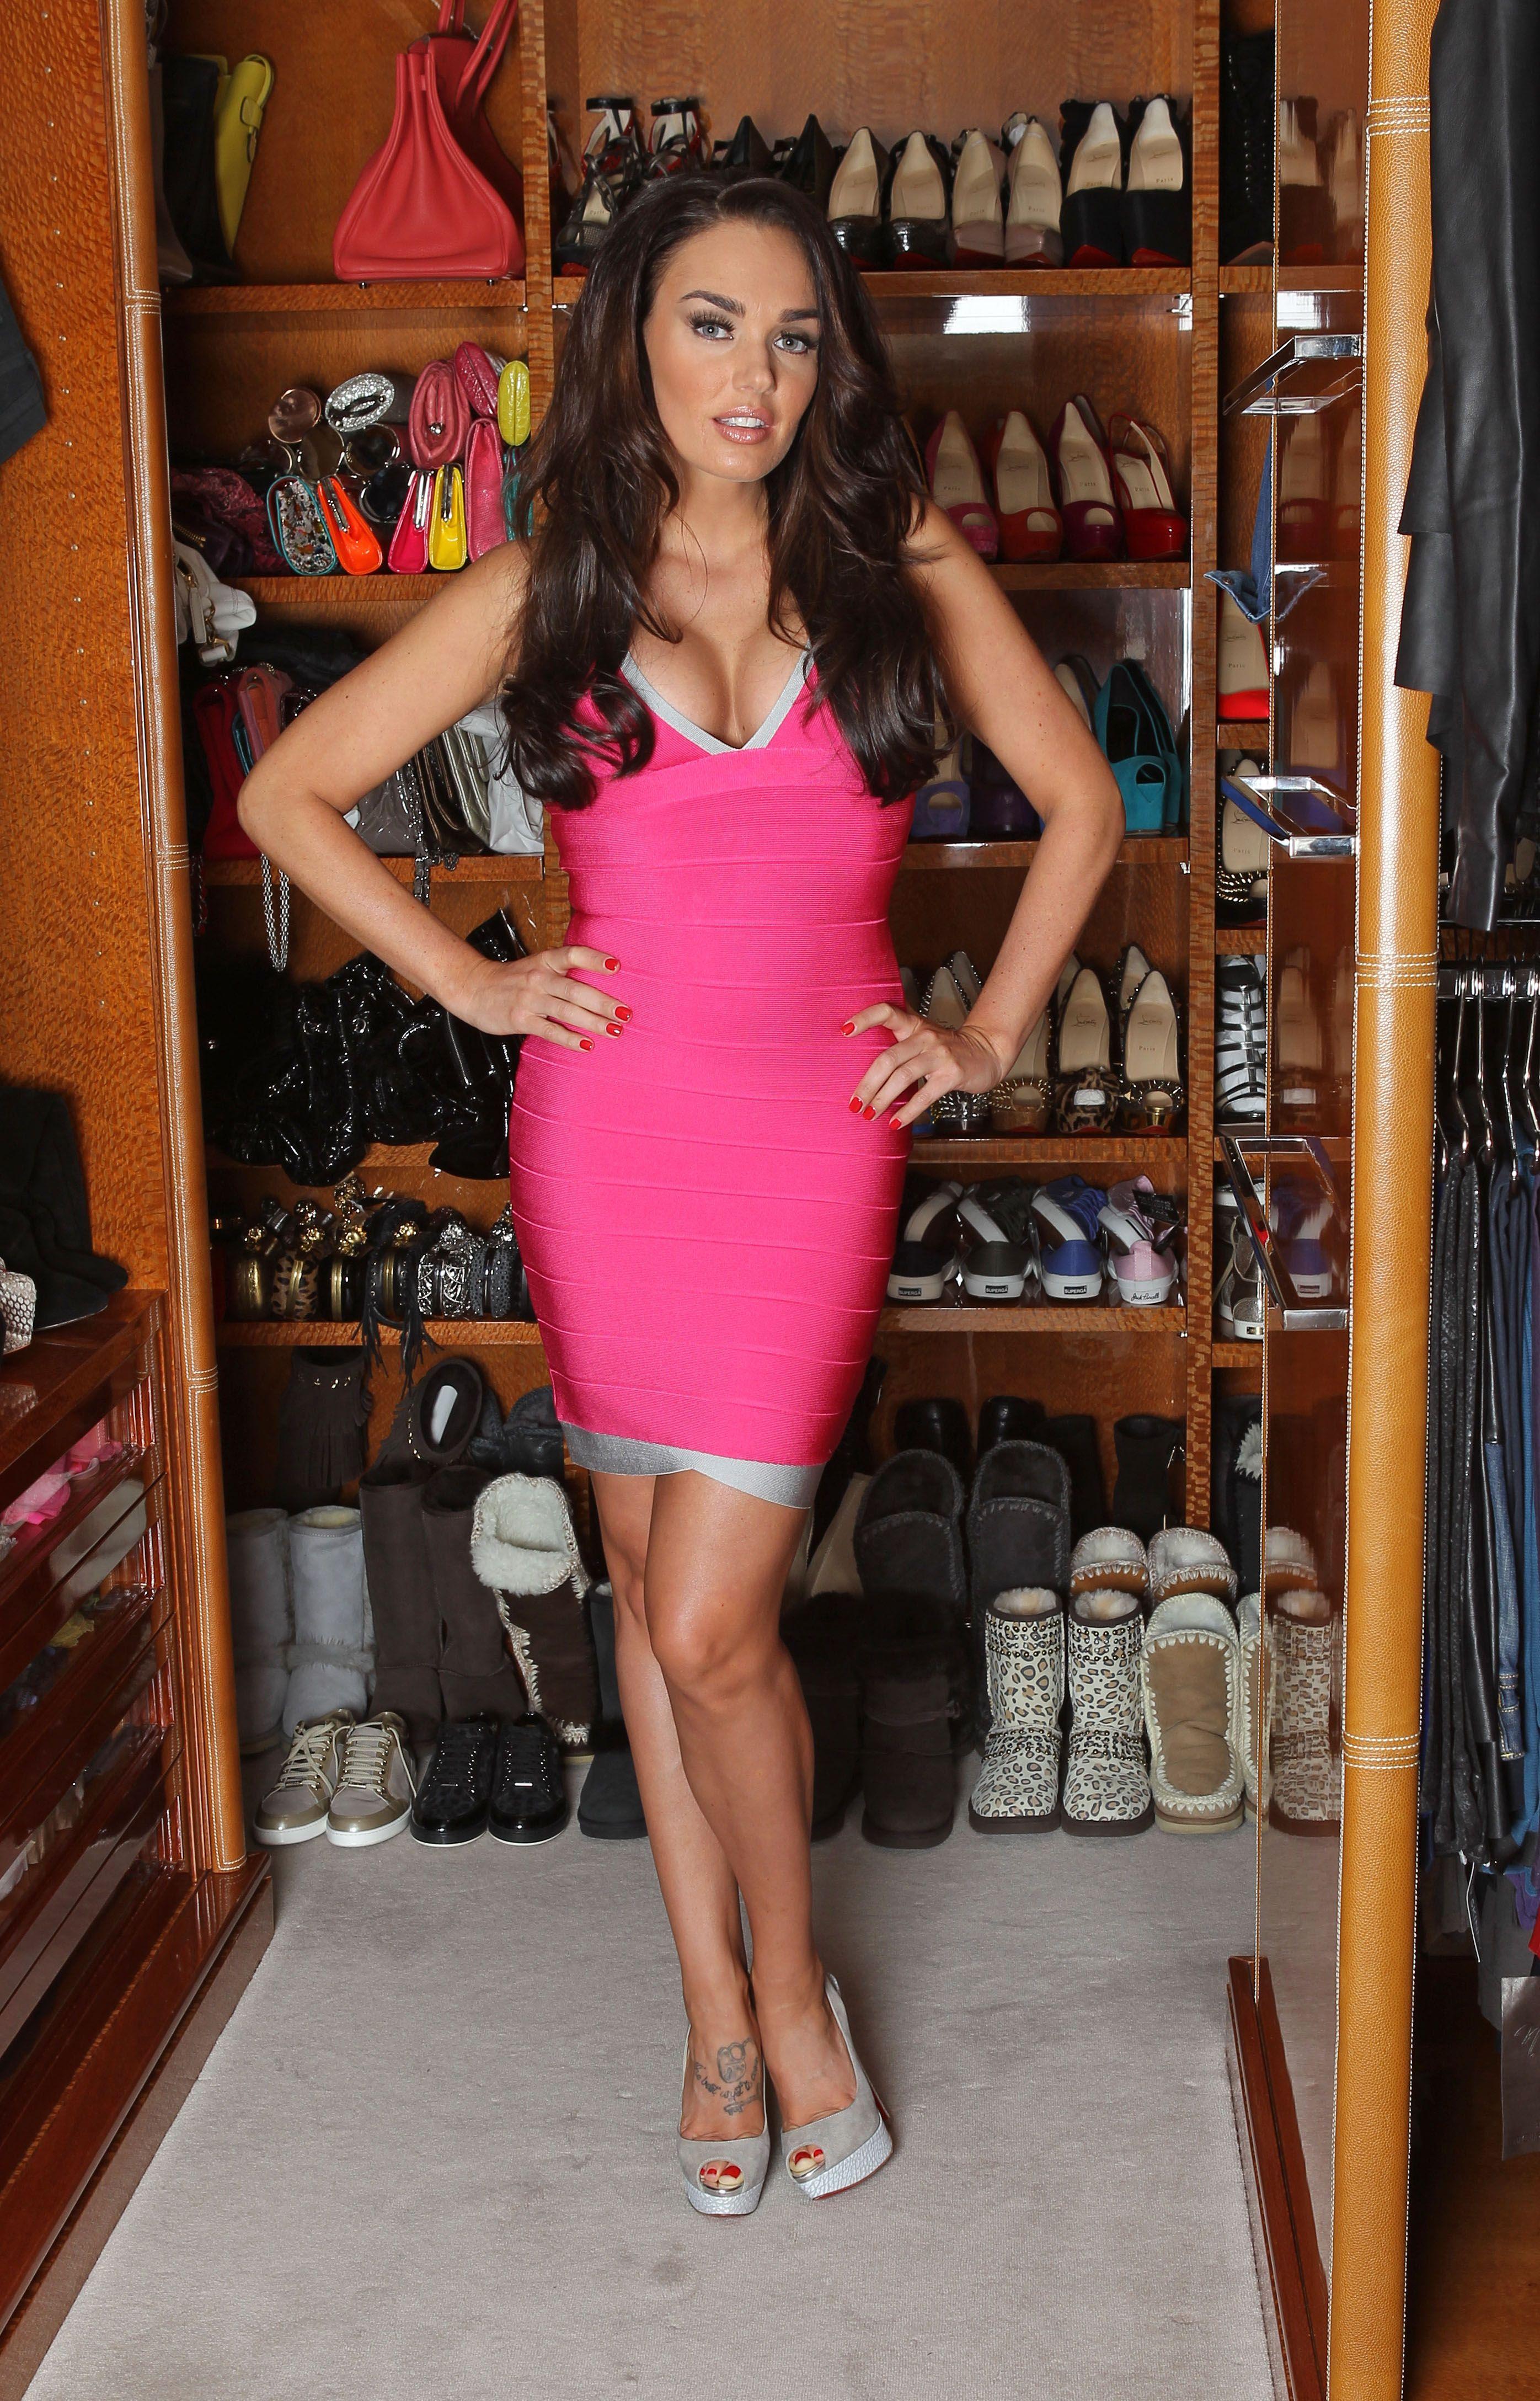 Tamara Ecclestone Feet JPEG Image 2792 — 4352 pixels